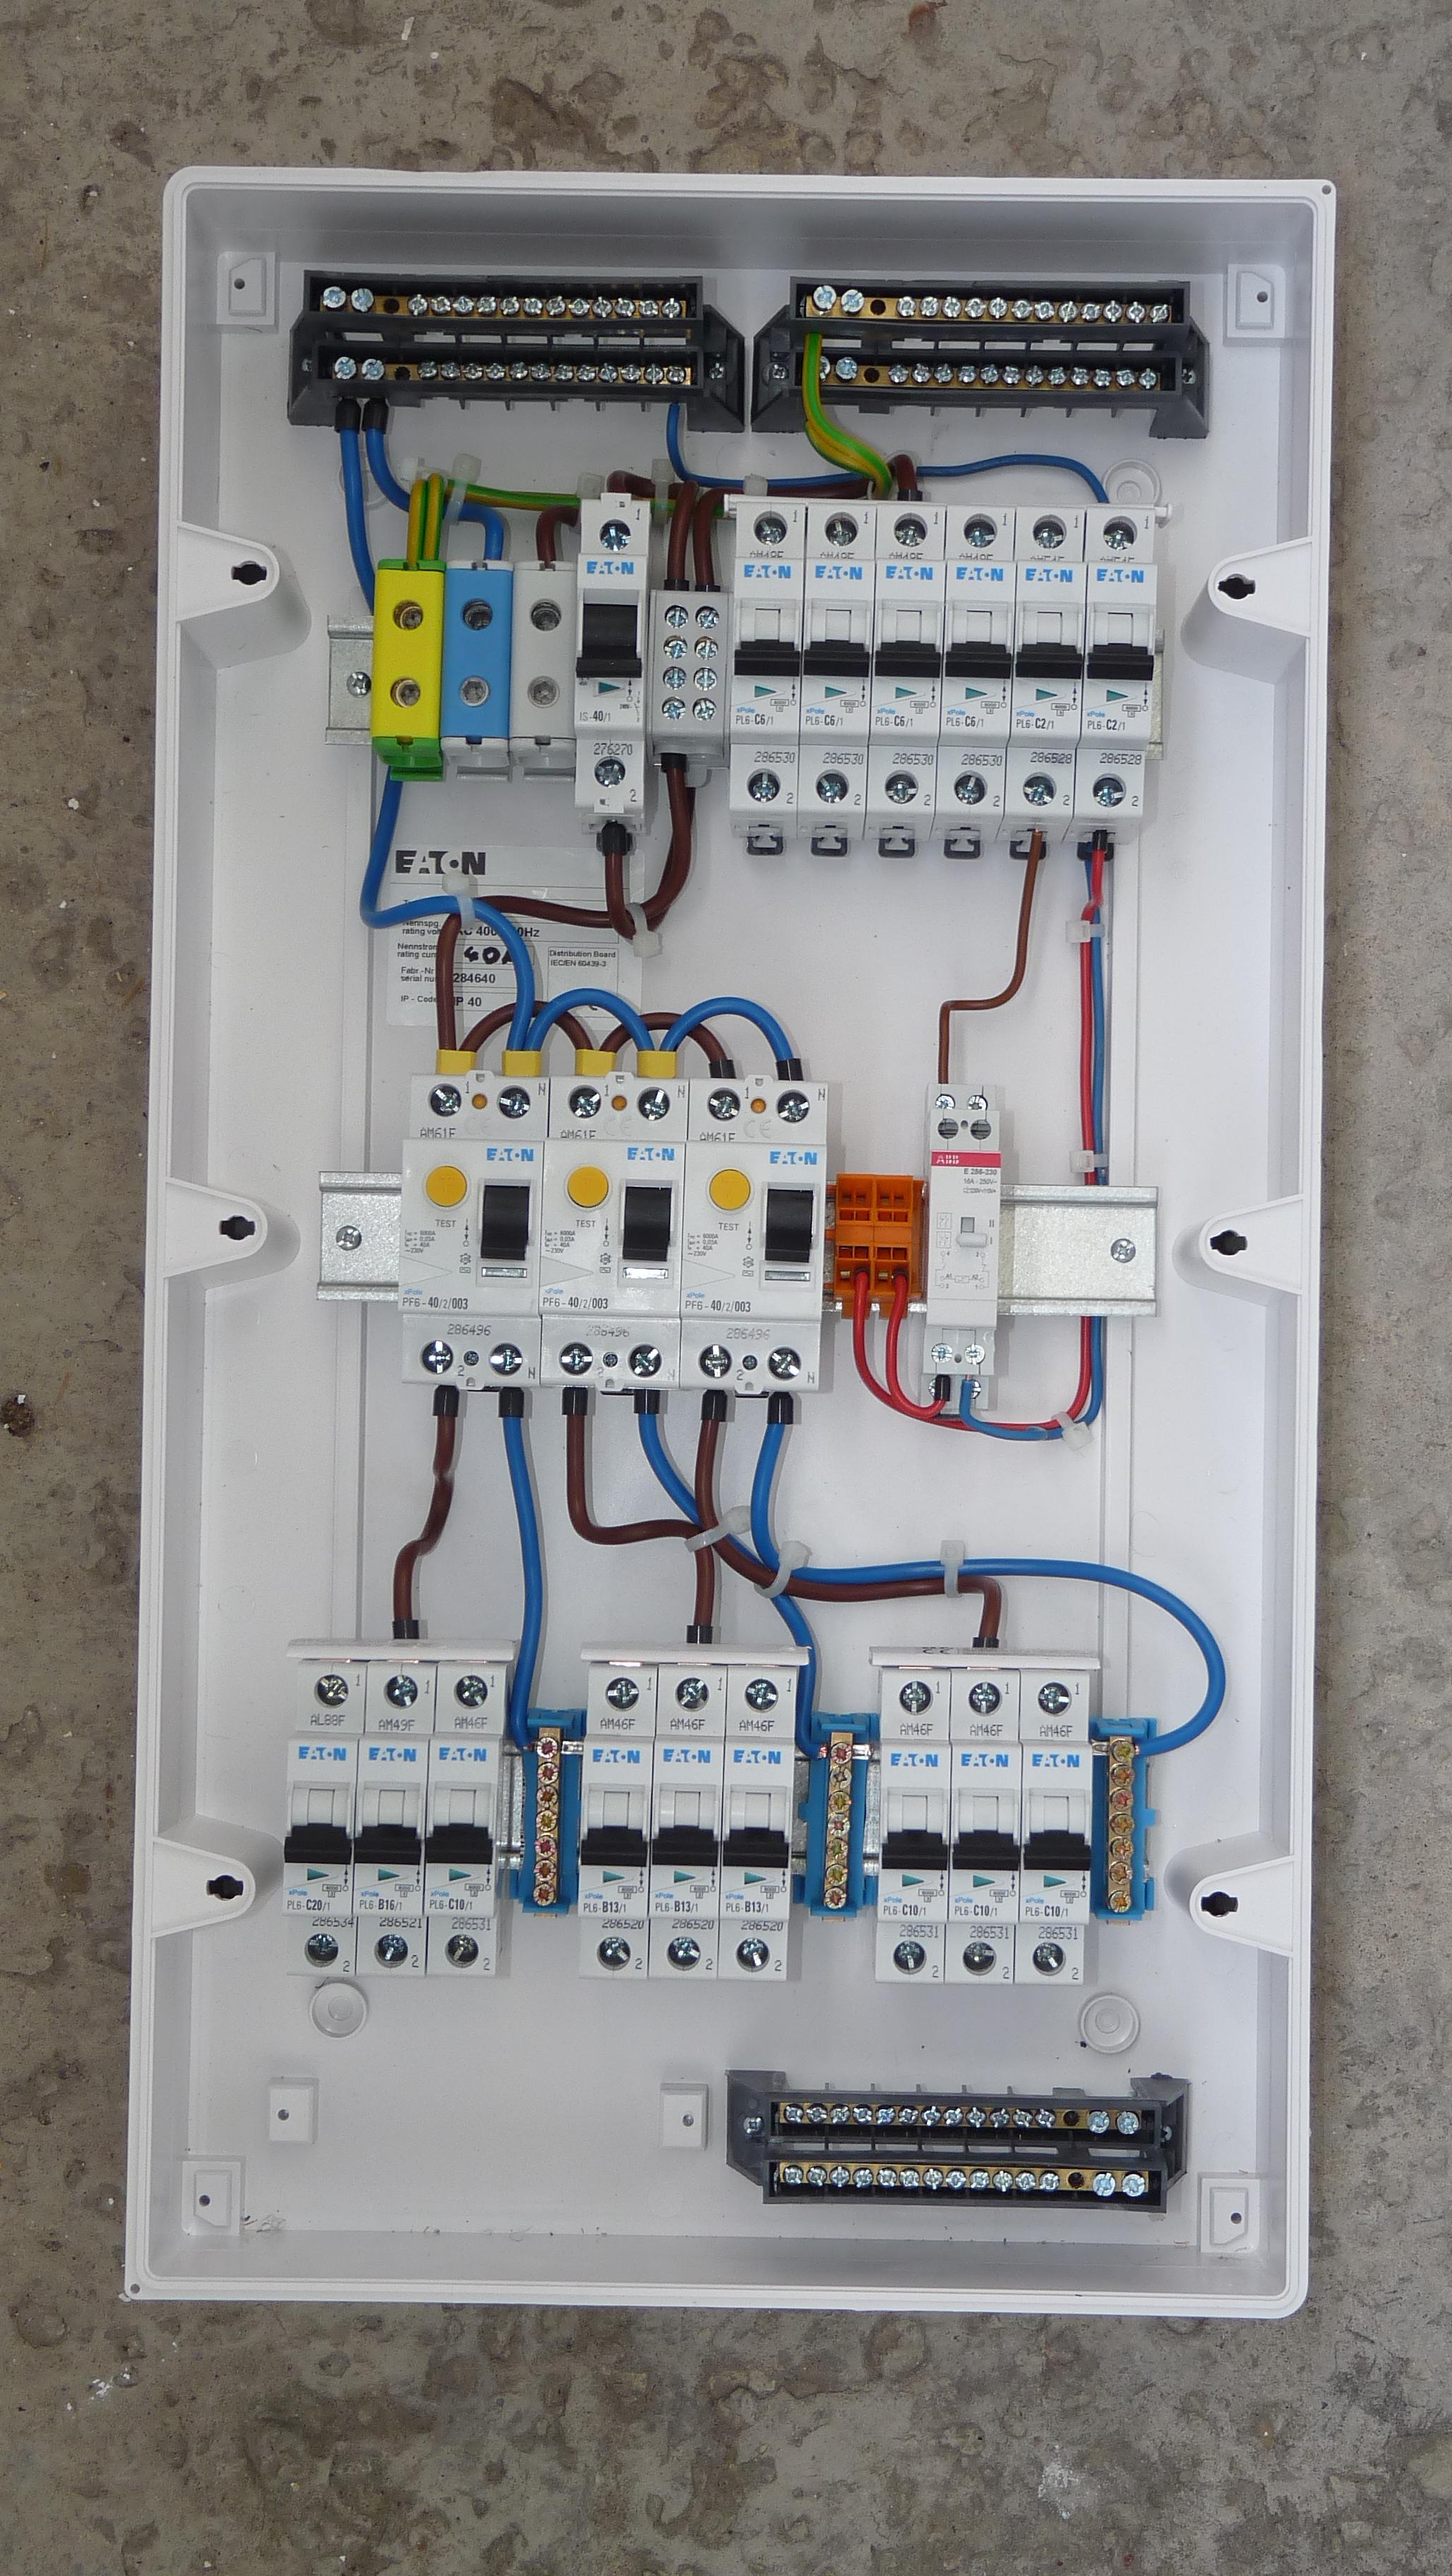 Surprising Distribution Board Wiring Pdf 9 5 Tramitesyconsultas Co Wiring Cloud Ostrrenstrafr09Org